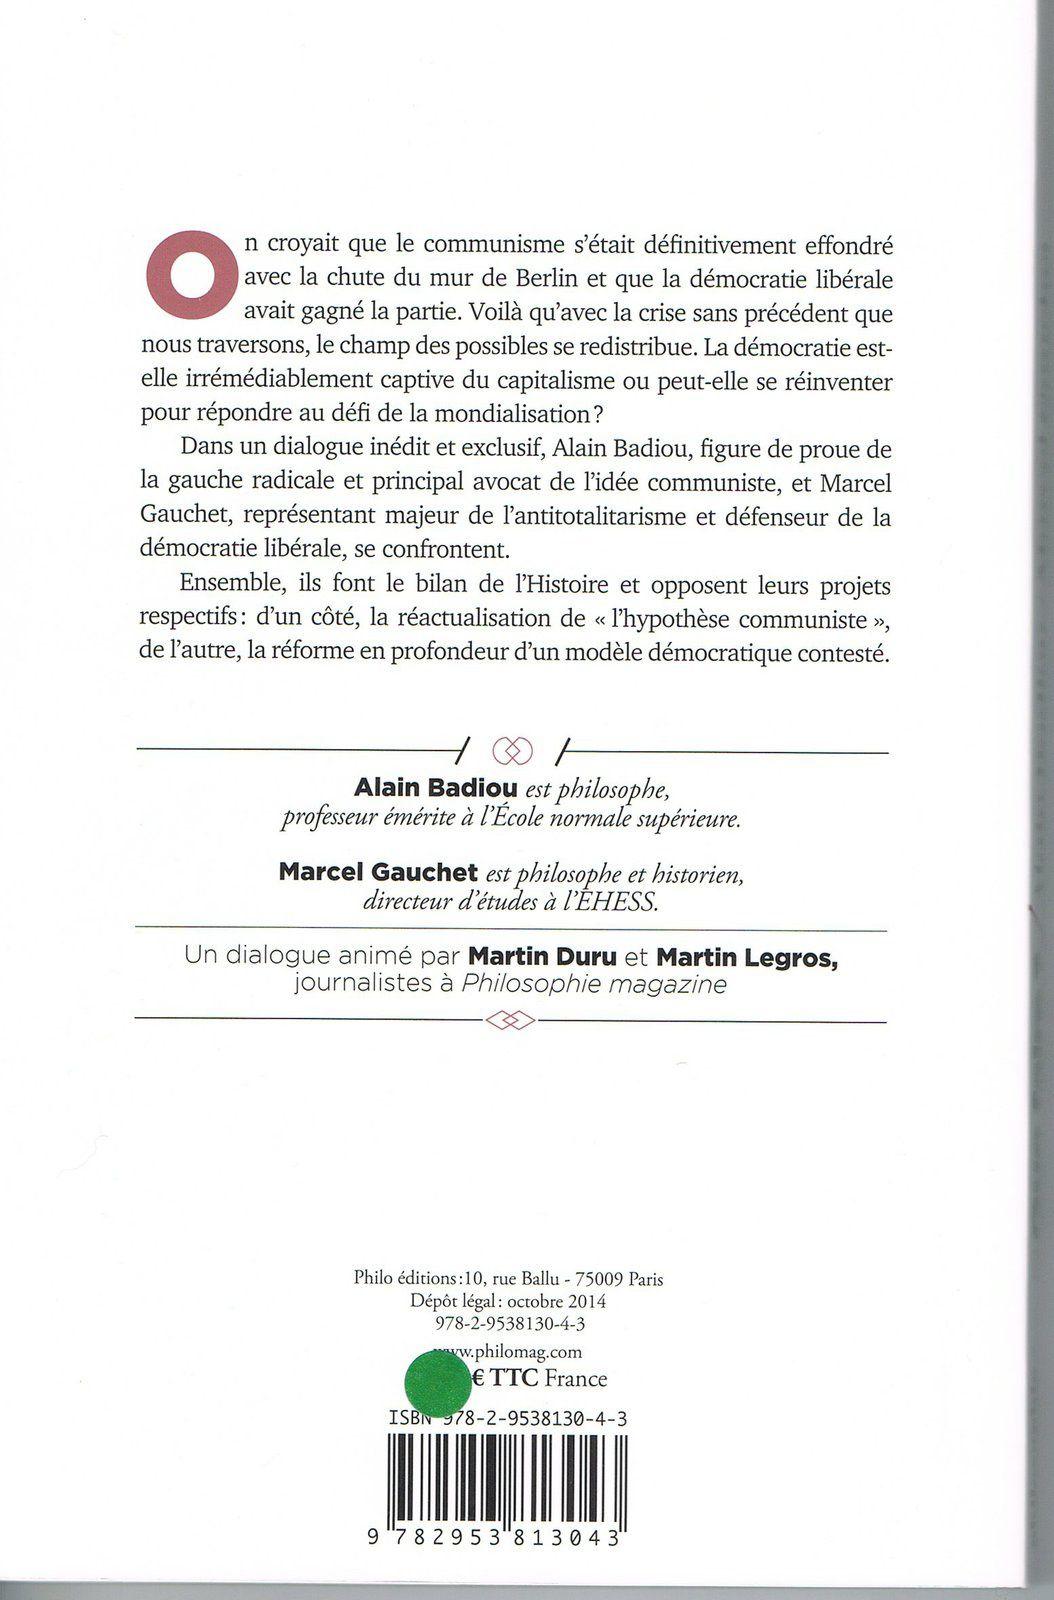 Badiou- Gauchet: un vrai débat